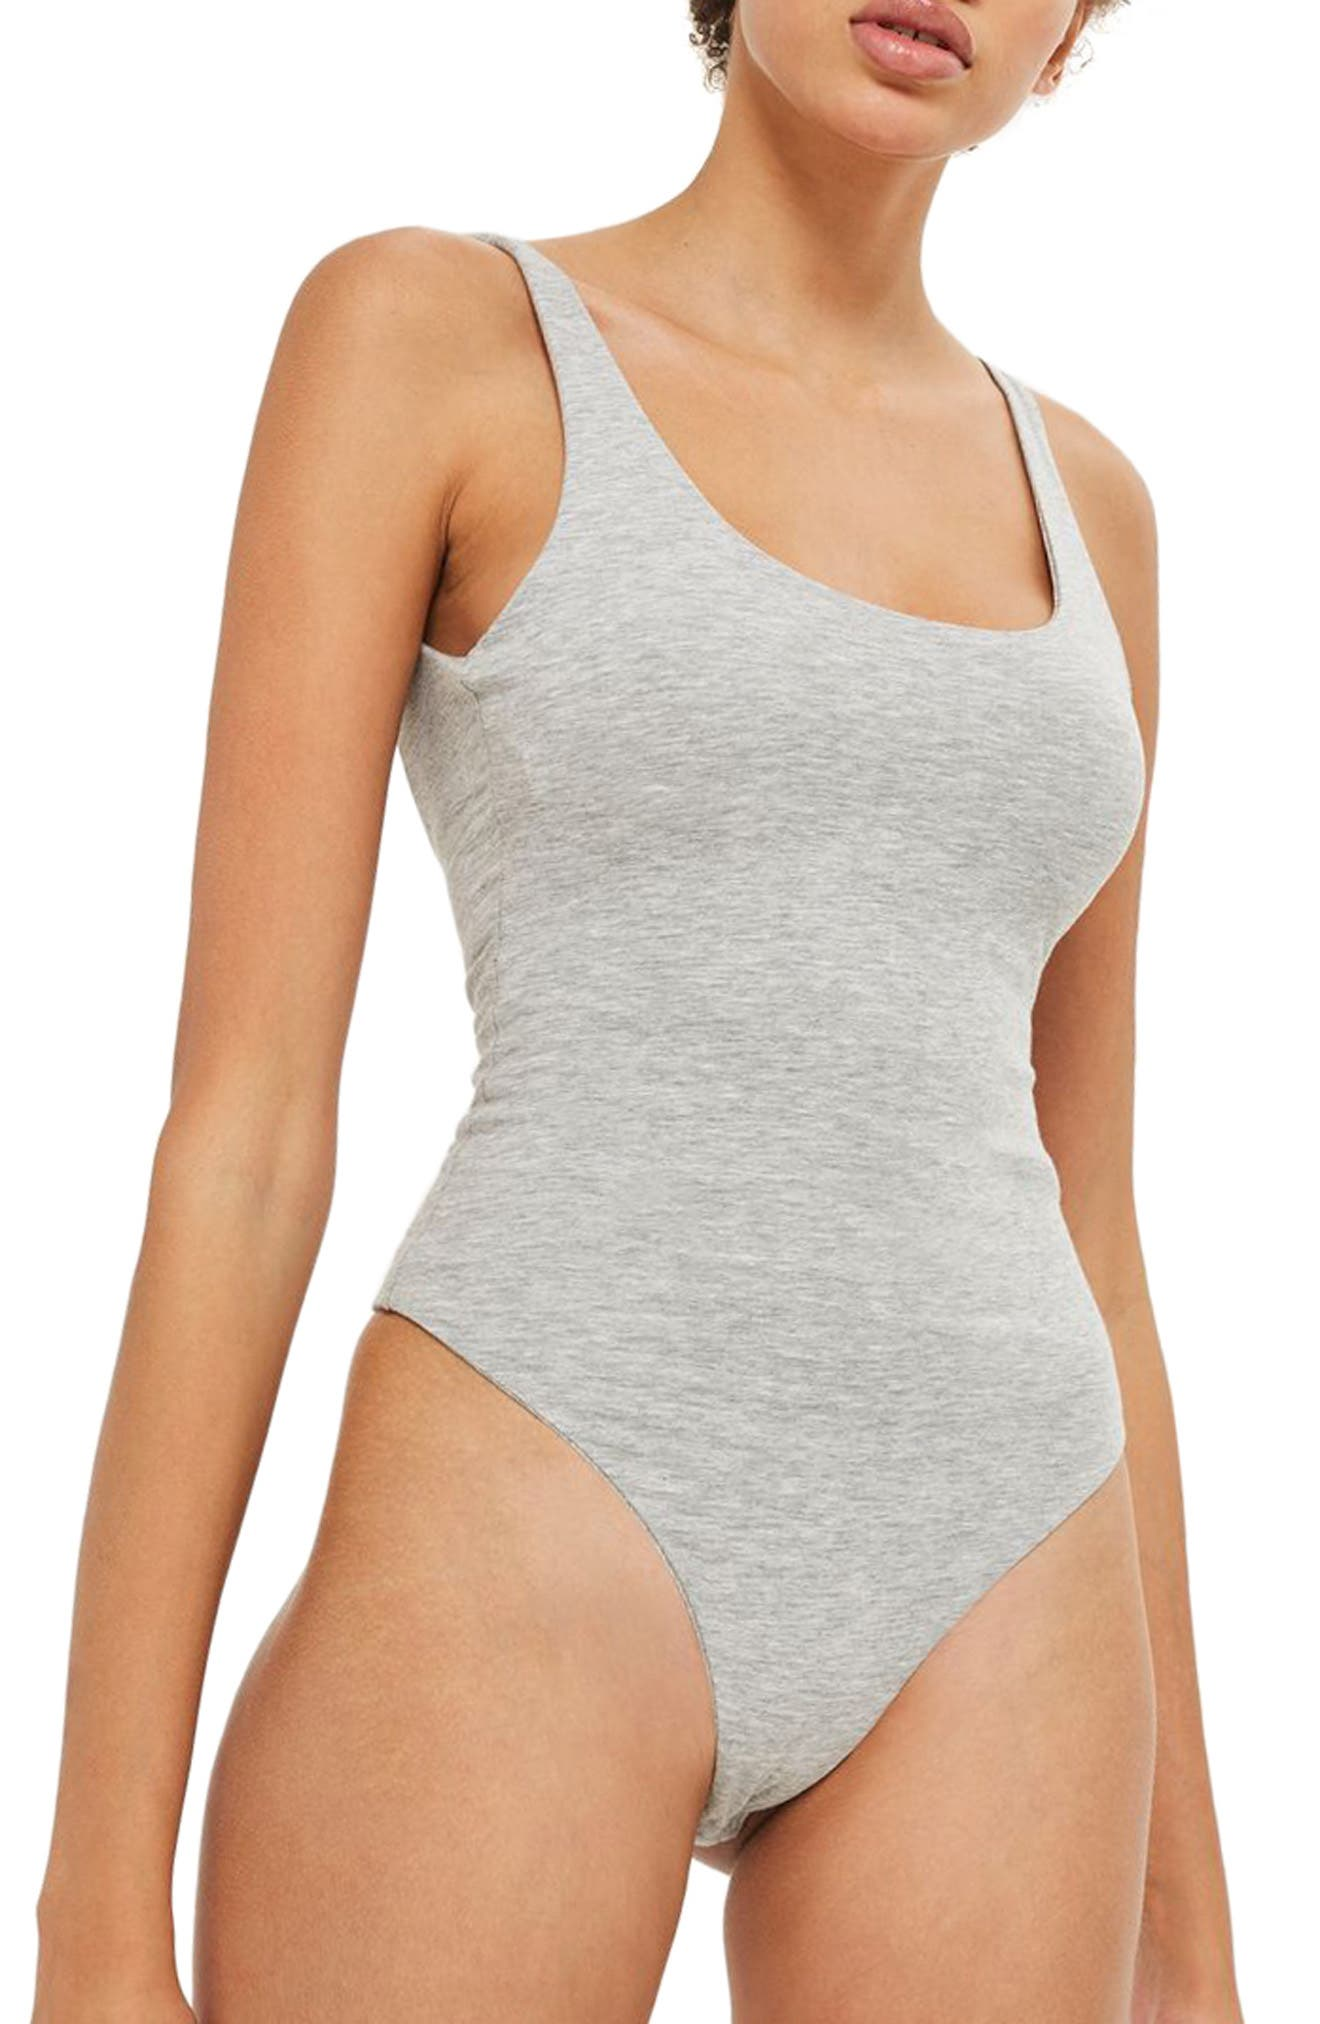 Scoop Back Thong Bodysuit,                             Main thumbnail 1, color,                             Grey